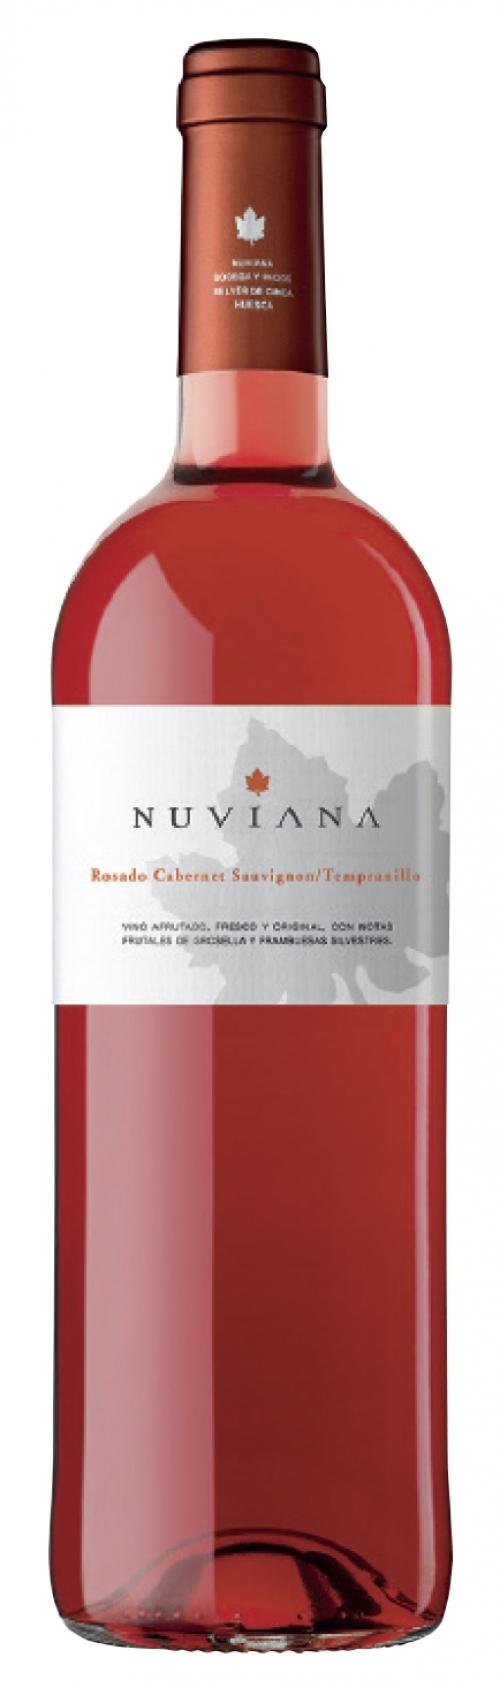 Nuviana Rosado